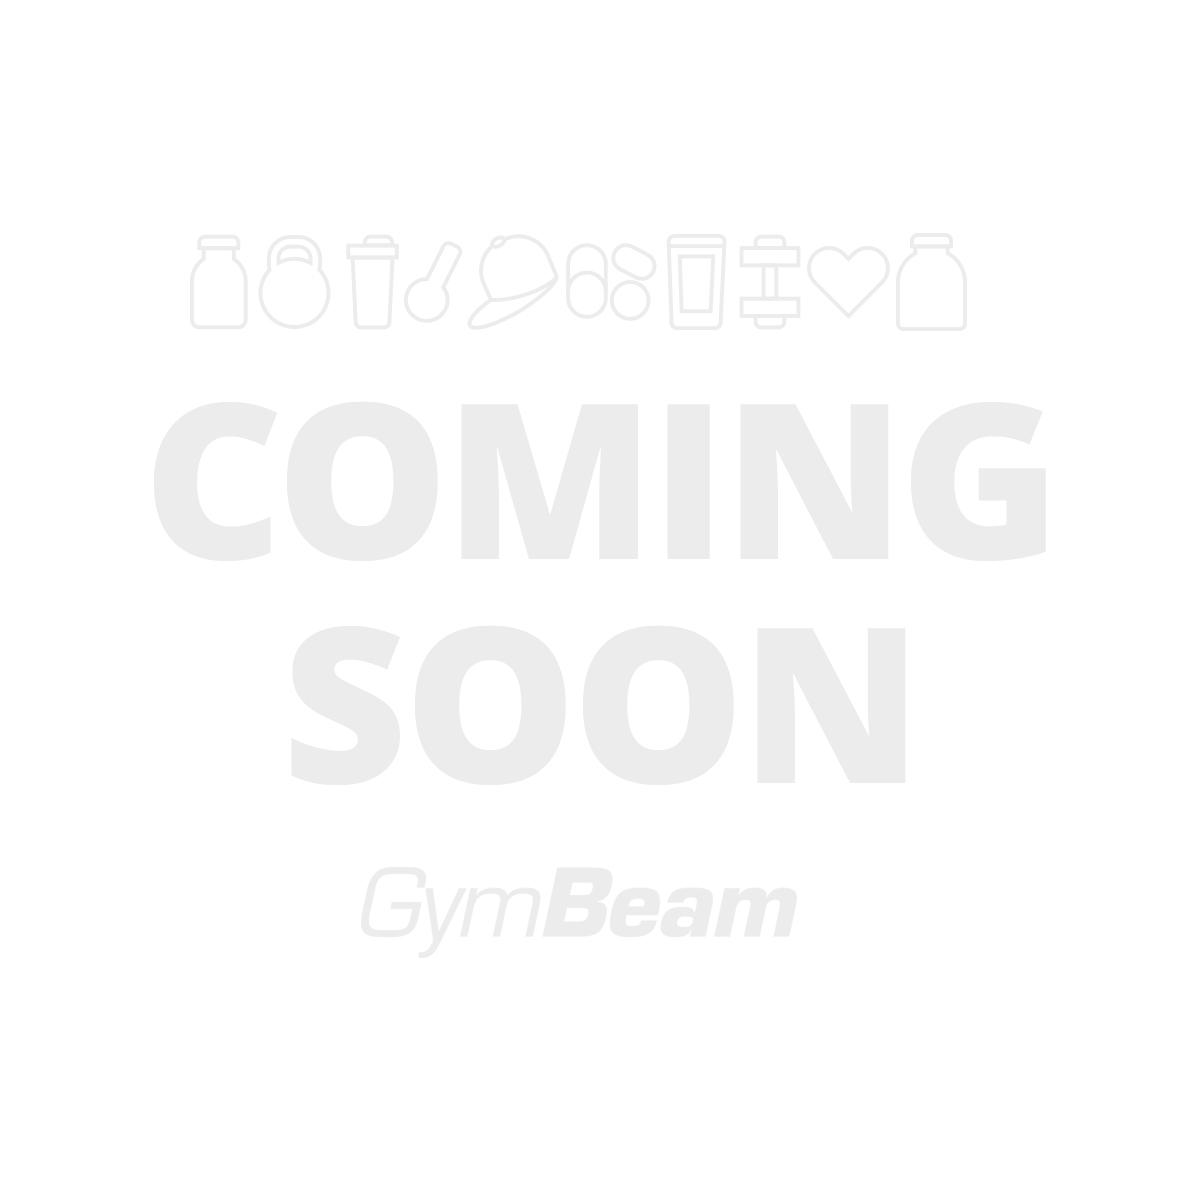 Arzător de grăsimi Hydroxycut Hardcore NEXT GEN - MuscleTech